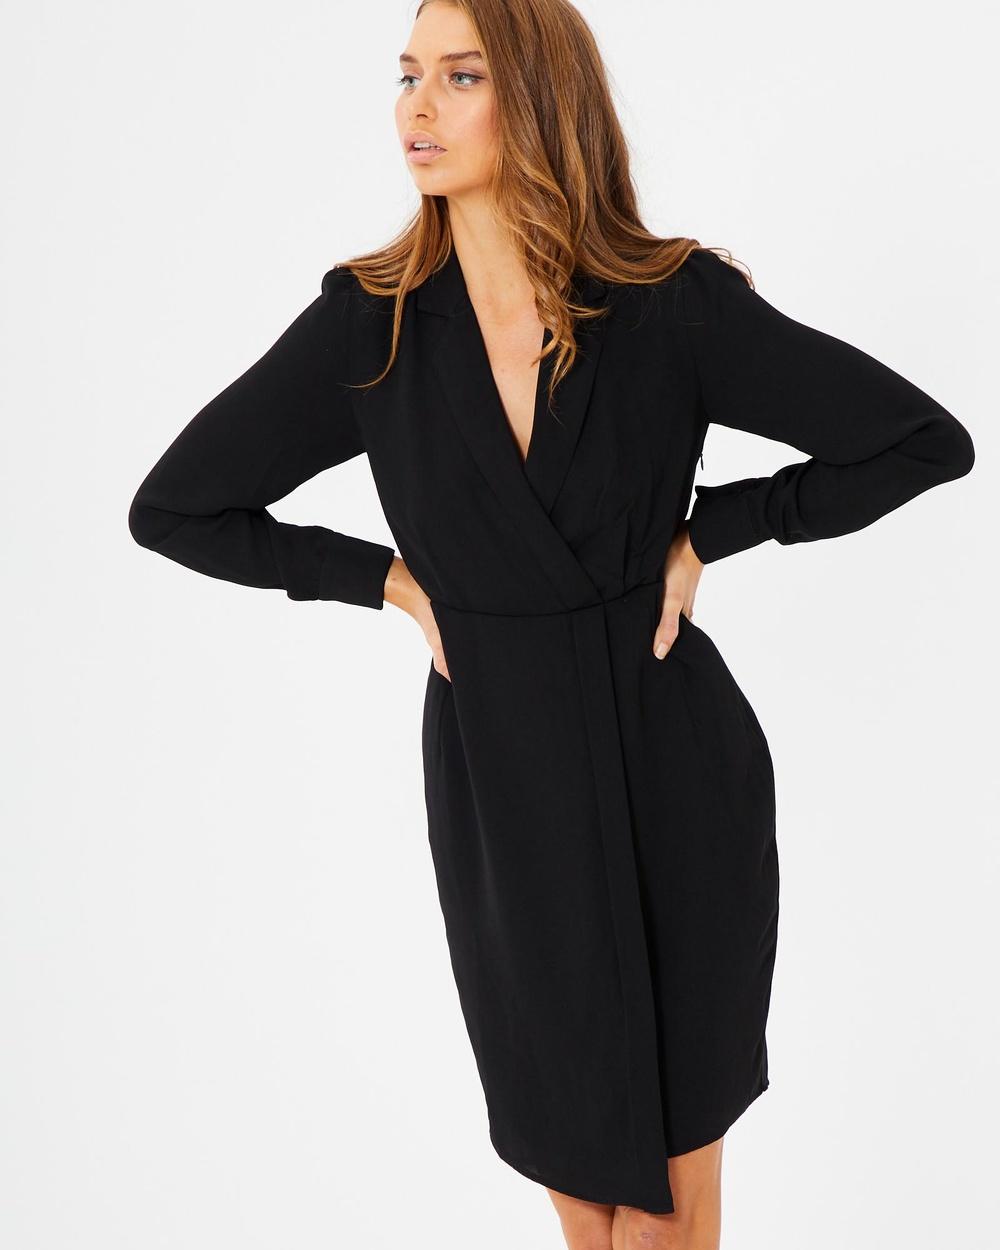 Tussah Lorena Shirt Dress Dresses Black Lorena Shirt Dress